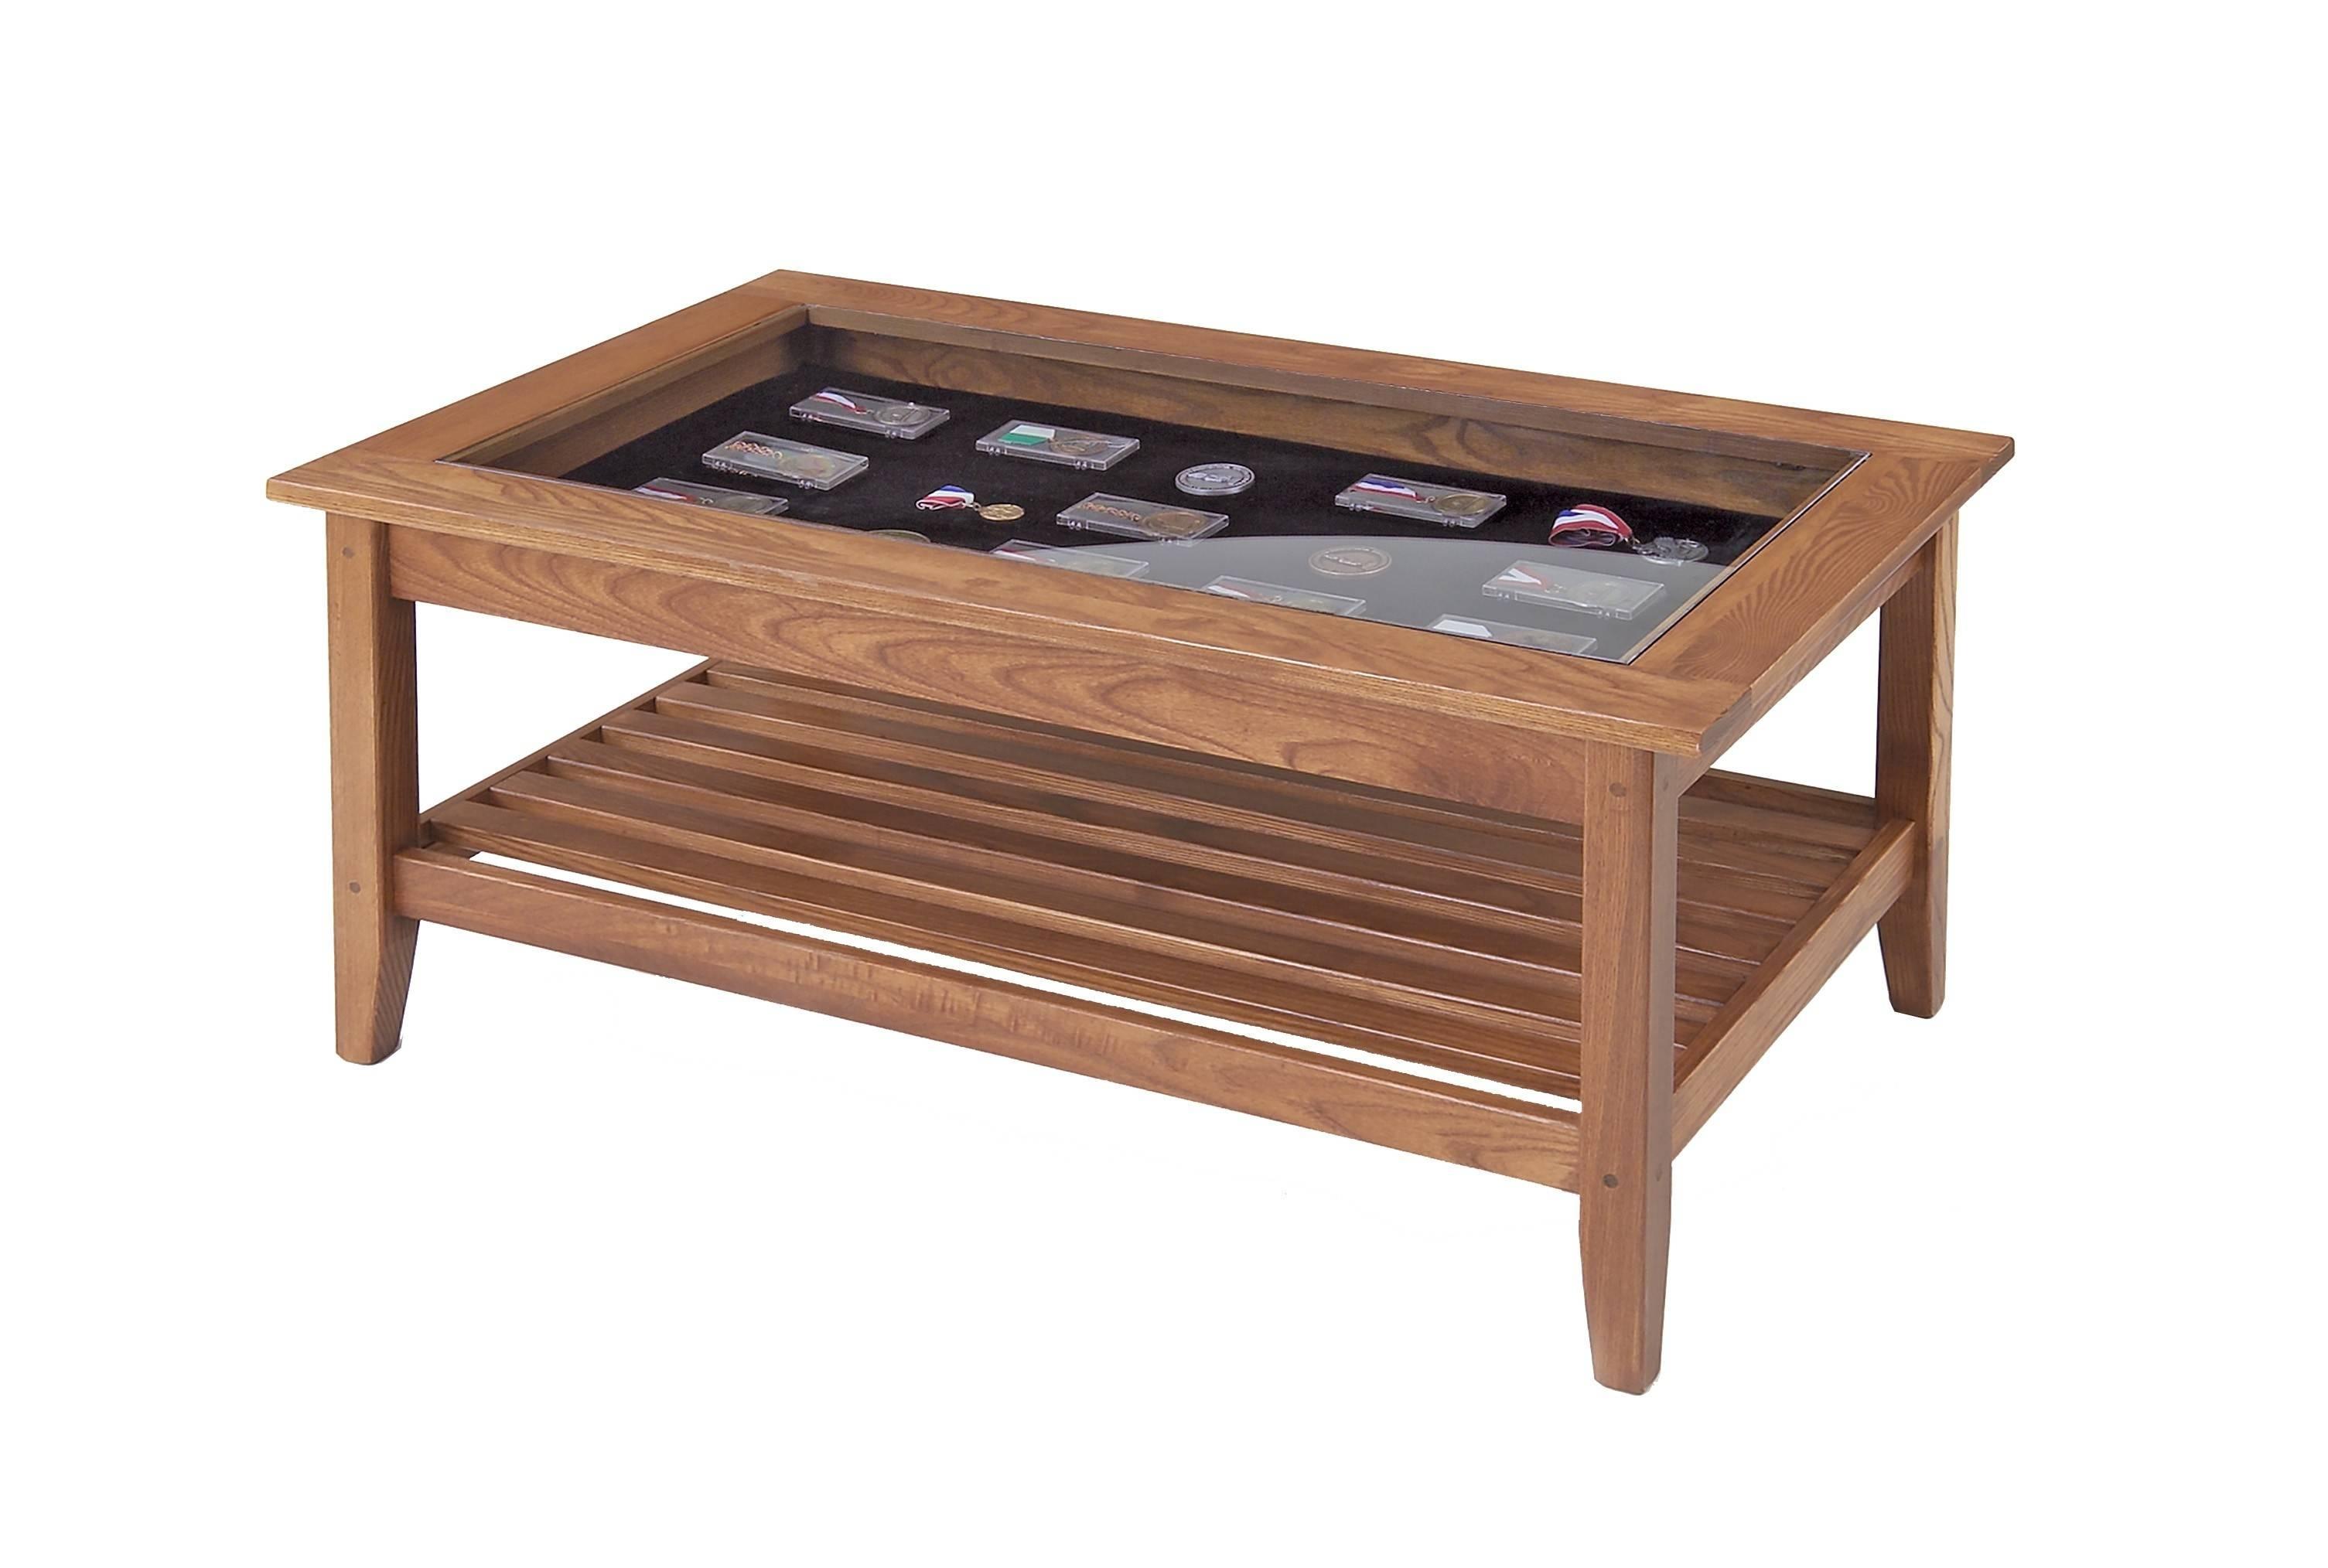 Coffee Table Glass Top Display Drawer | Home Design Ideas for Coffee Tables With Glass Top Display Drawer (Image 11 of 30)